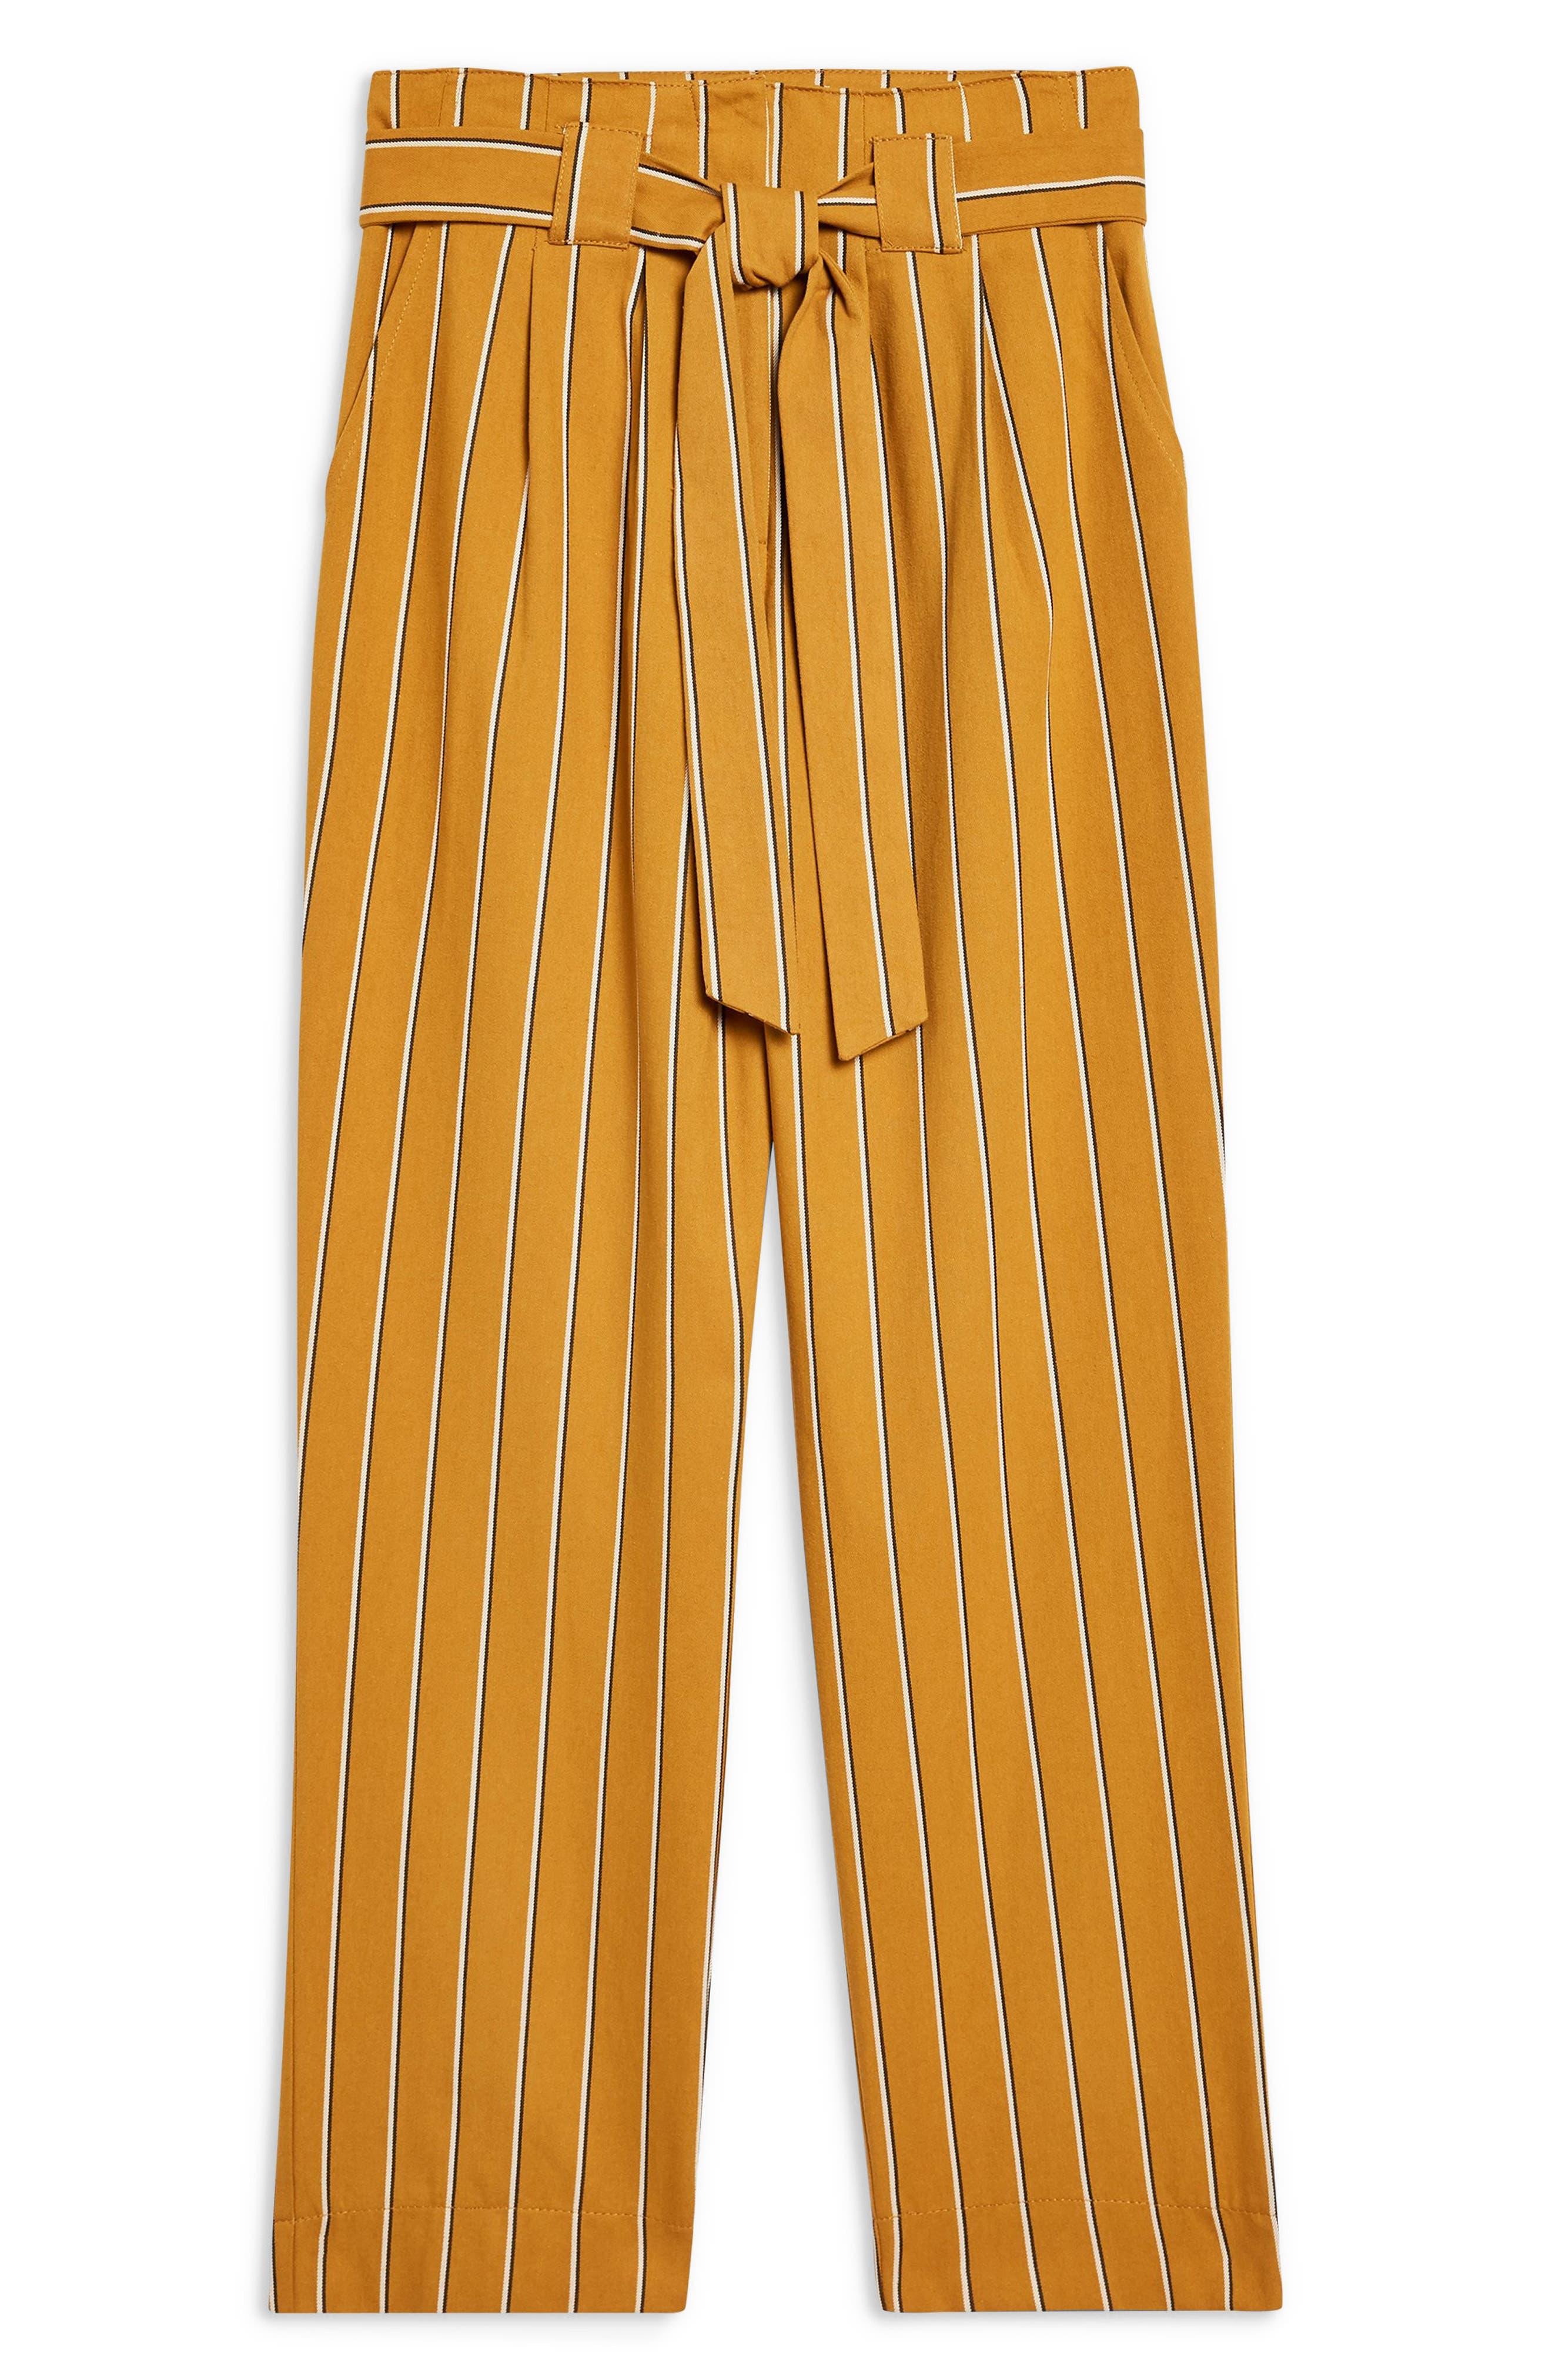 Polly Stripe Peg Trousers,                             Alternate thumbnail 4, color,                             MUSTARD MULTI